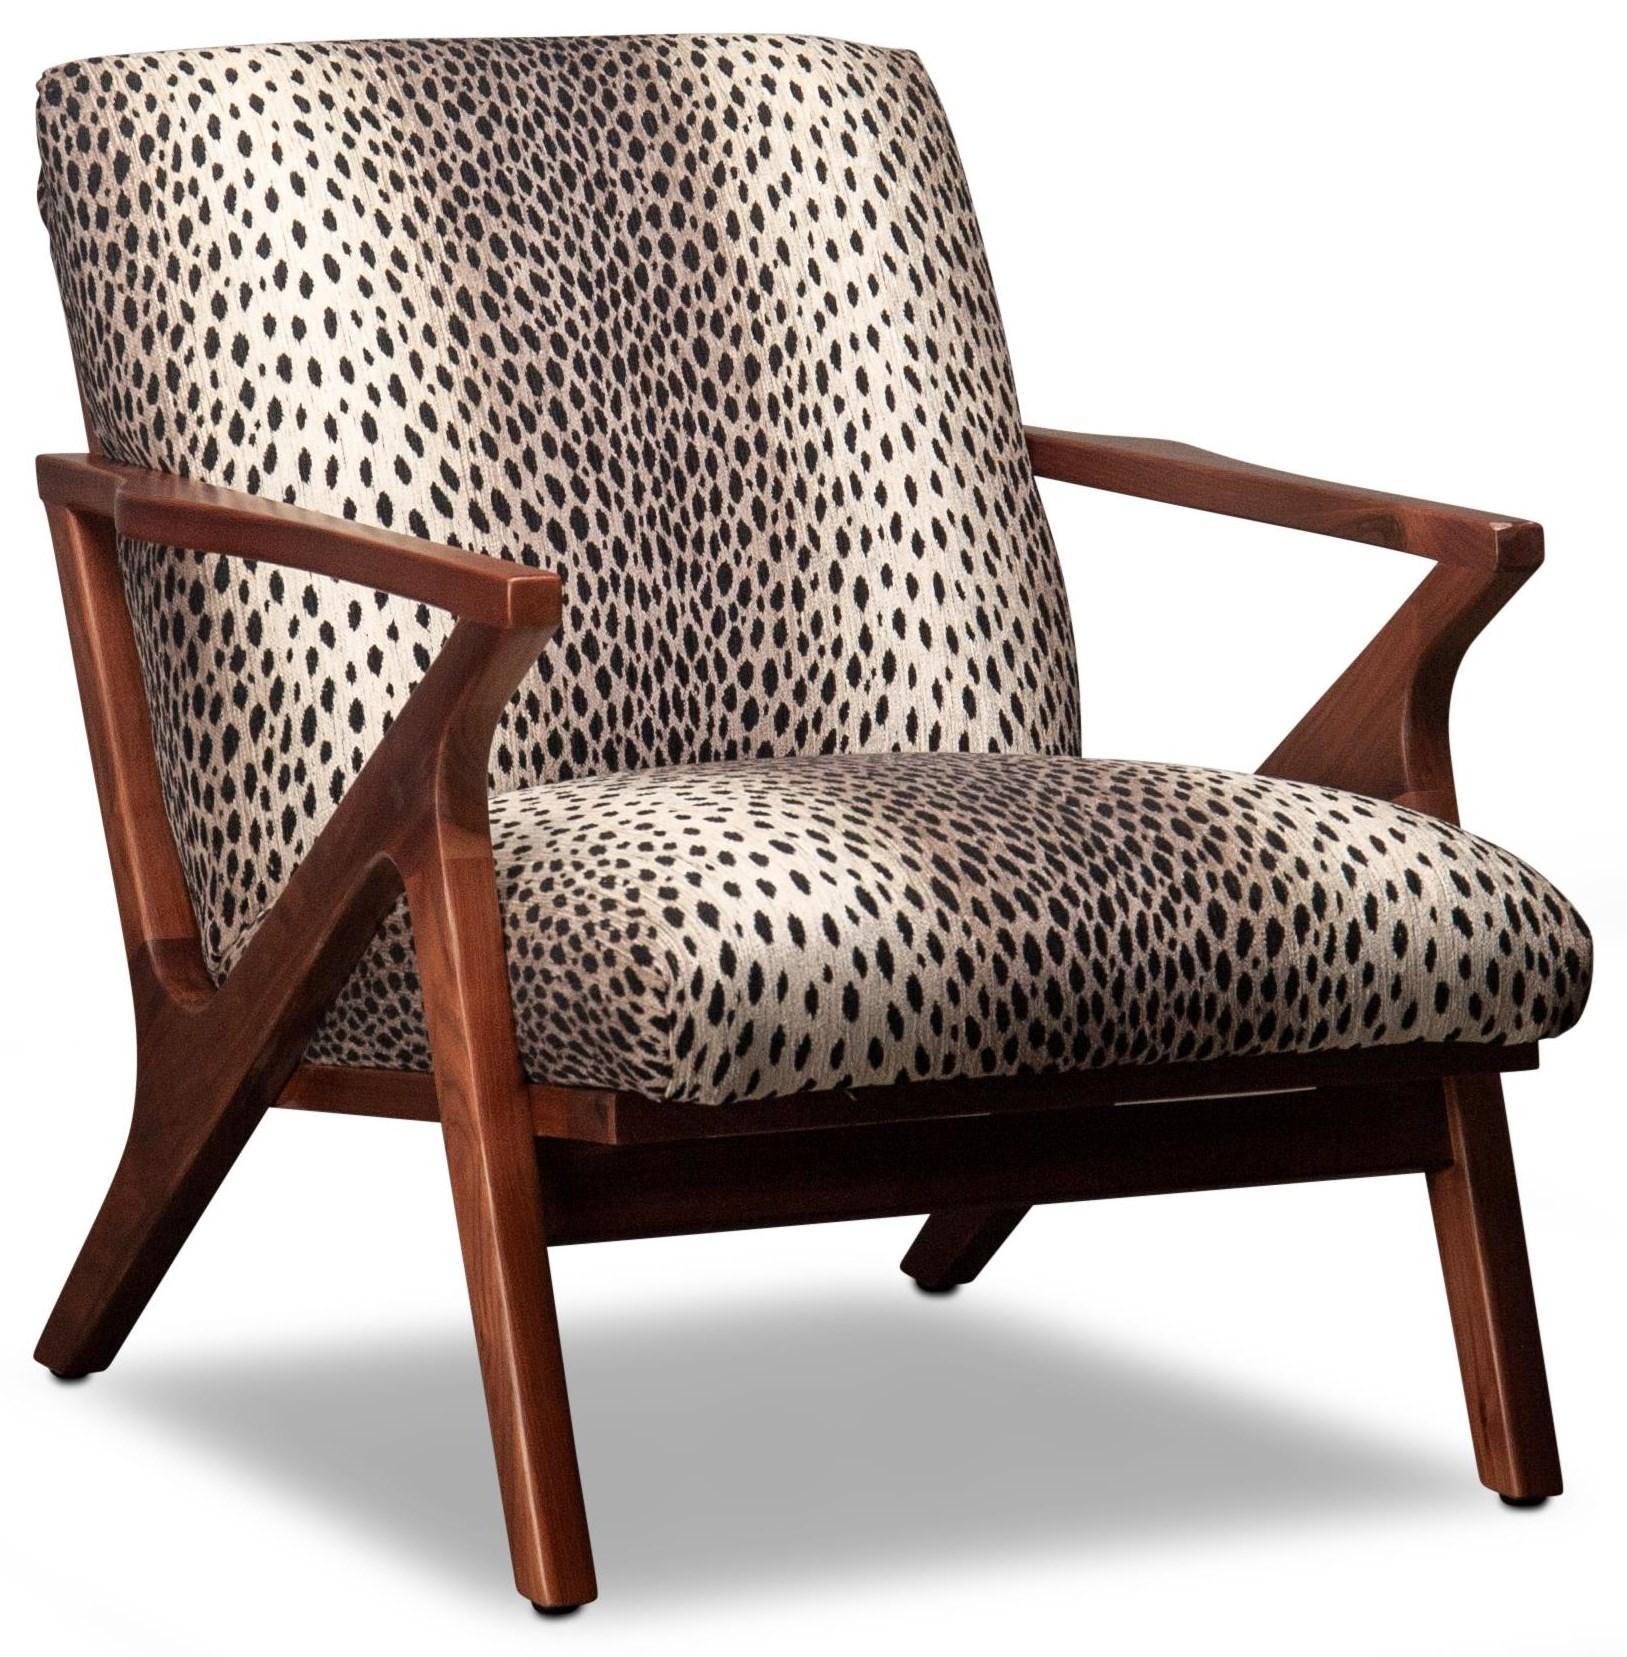 Brielle Brielle Wood Accent Chair by Jonathan Louis at Morris Home